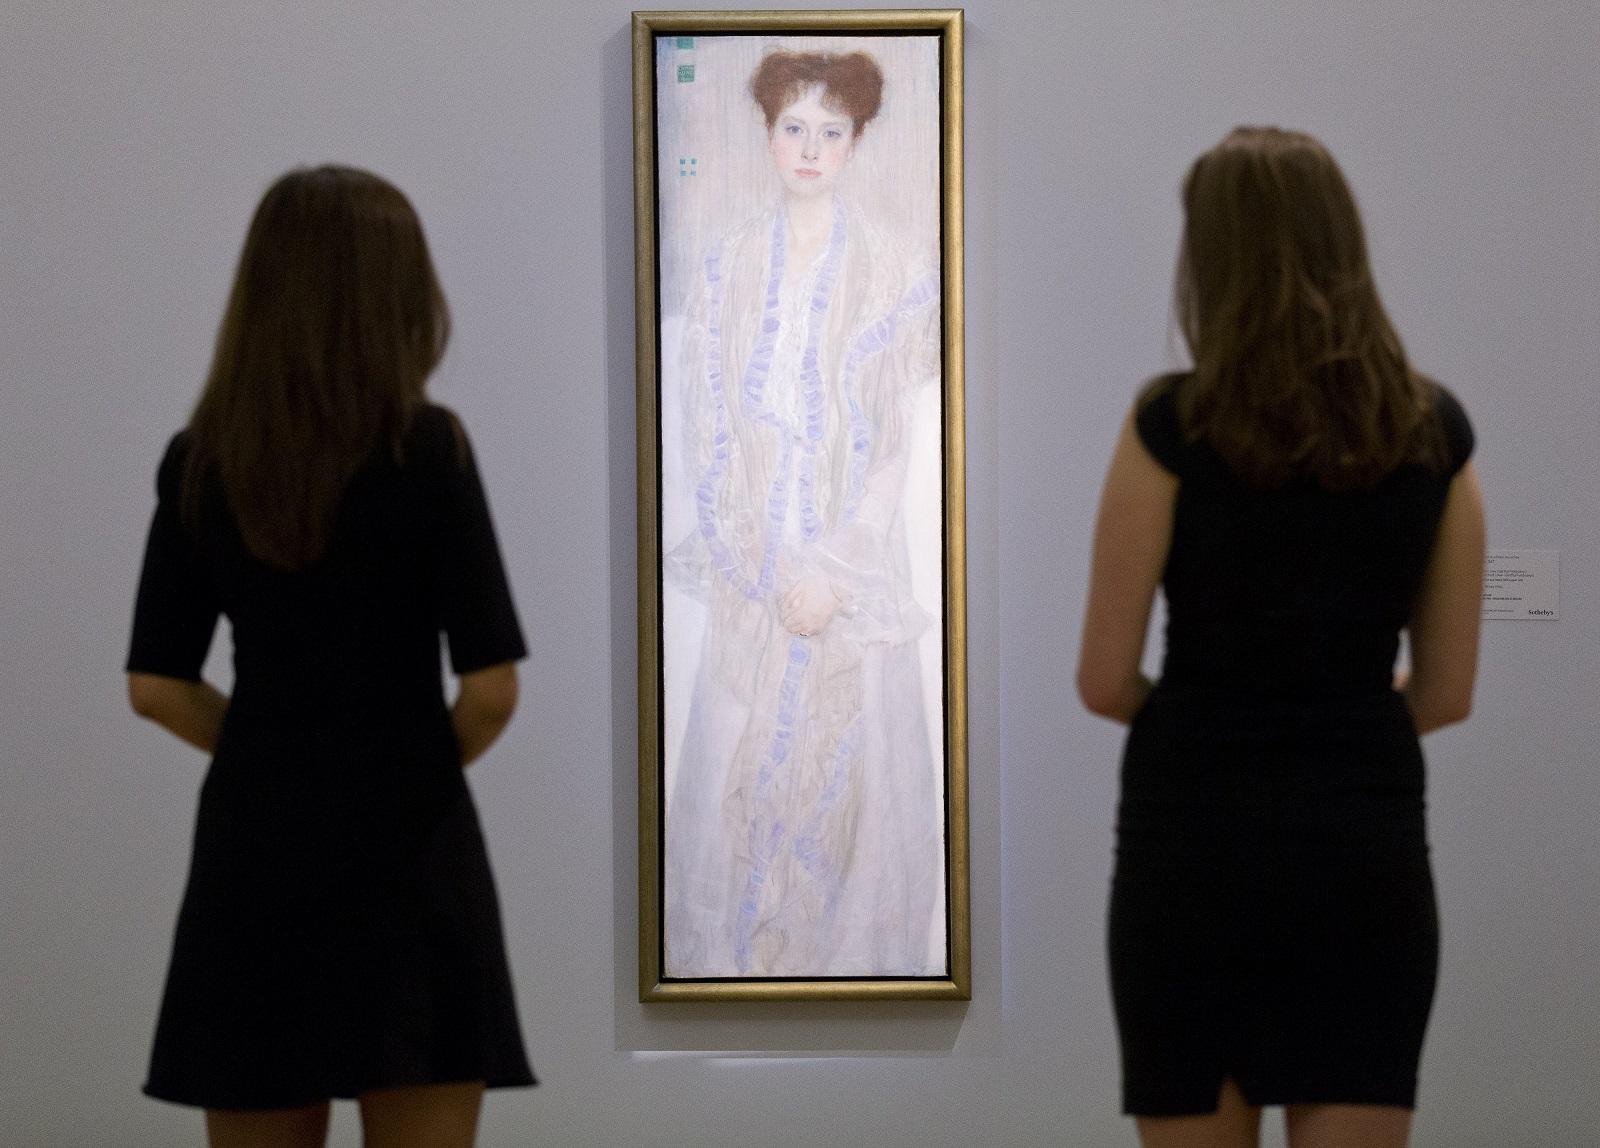 Portrait of Gertrude Loew by Gustav Klimt